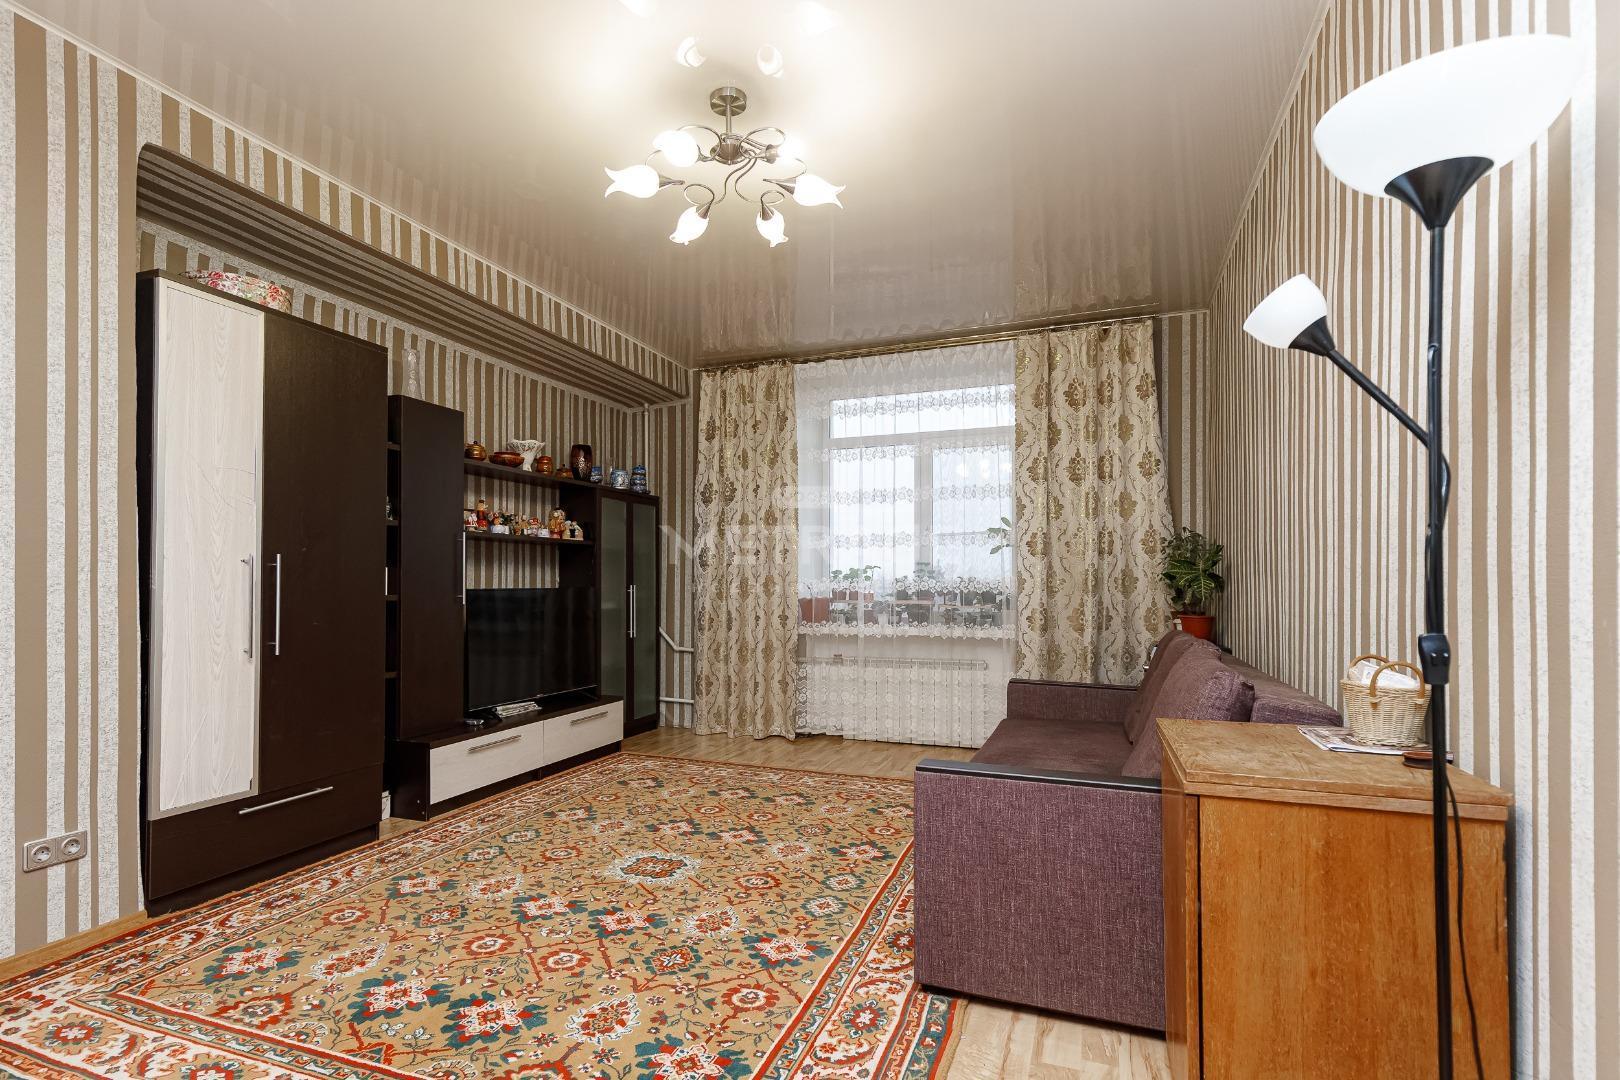 Котовского, 17, 2-комнатная квартира